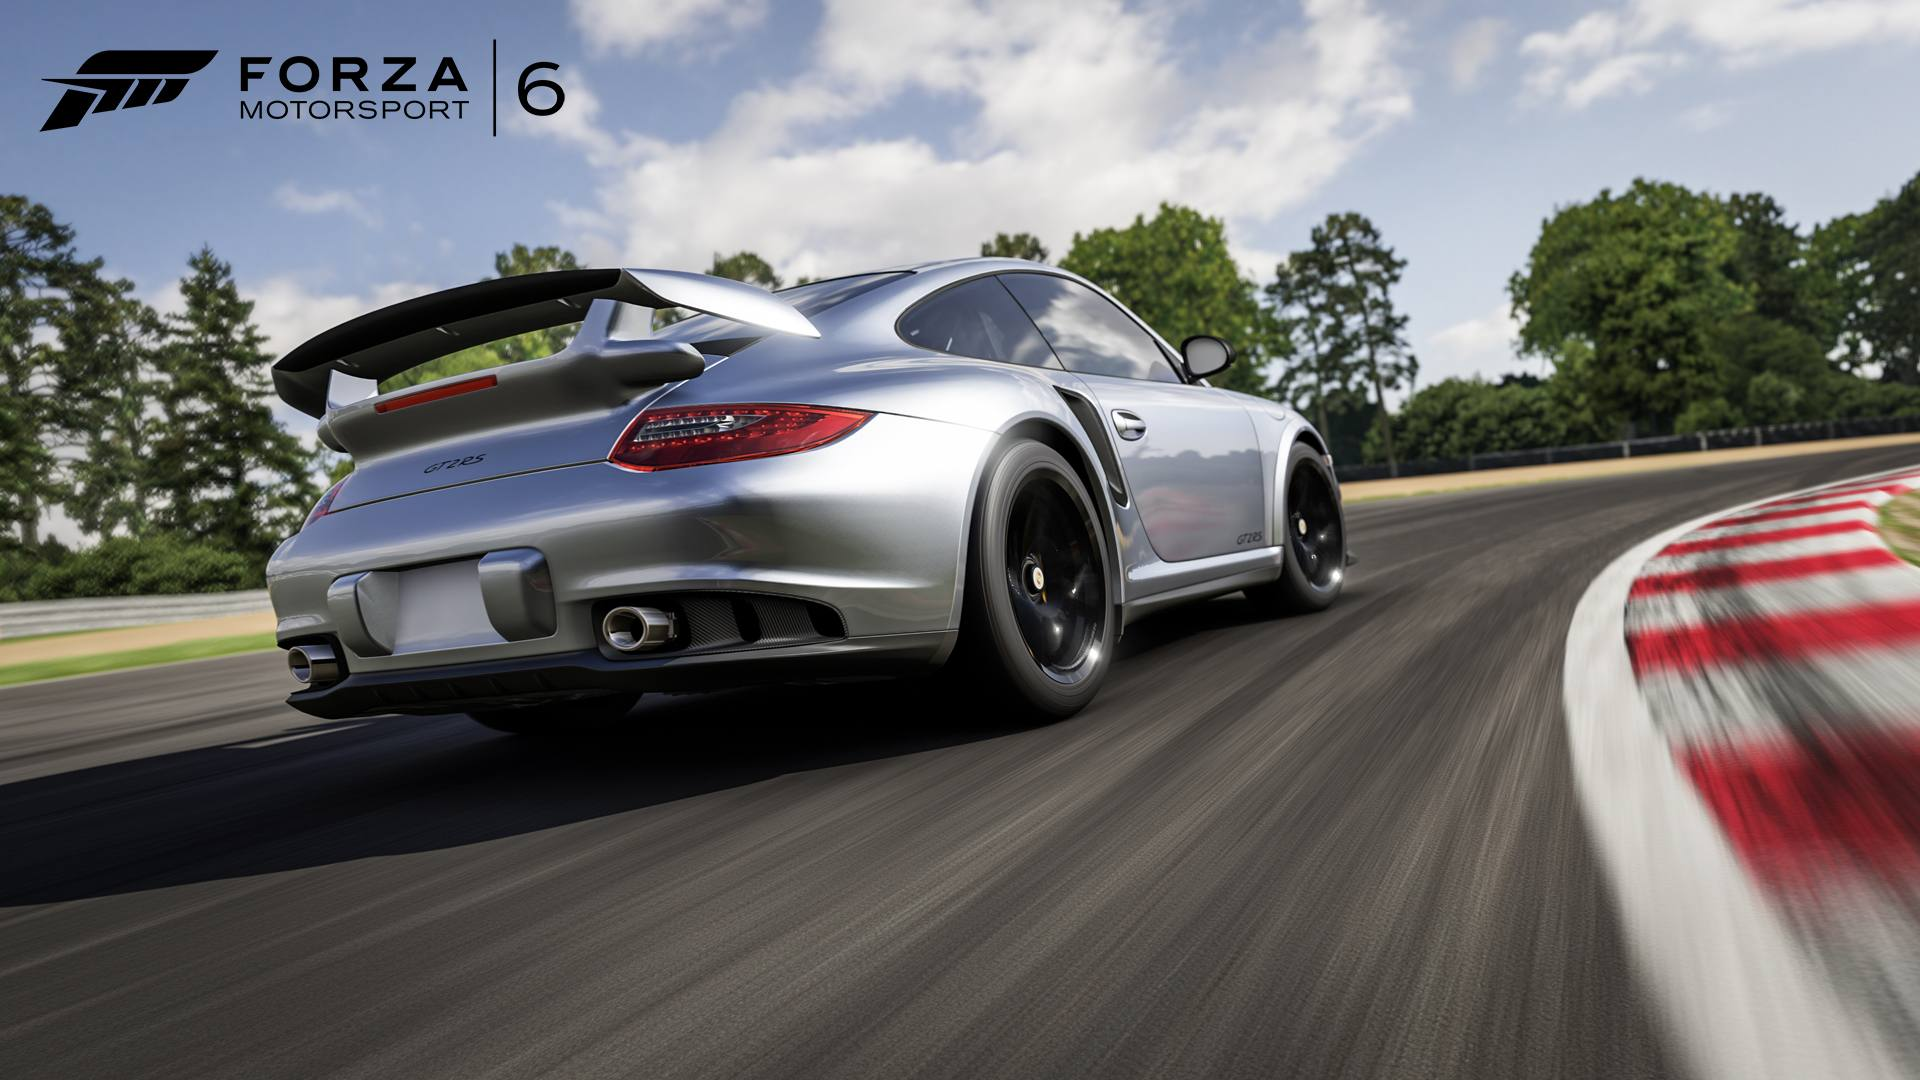 Forza Motorsport 6 01-03-16 2012 Porsche 911 GT2 RS